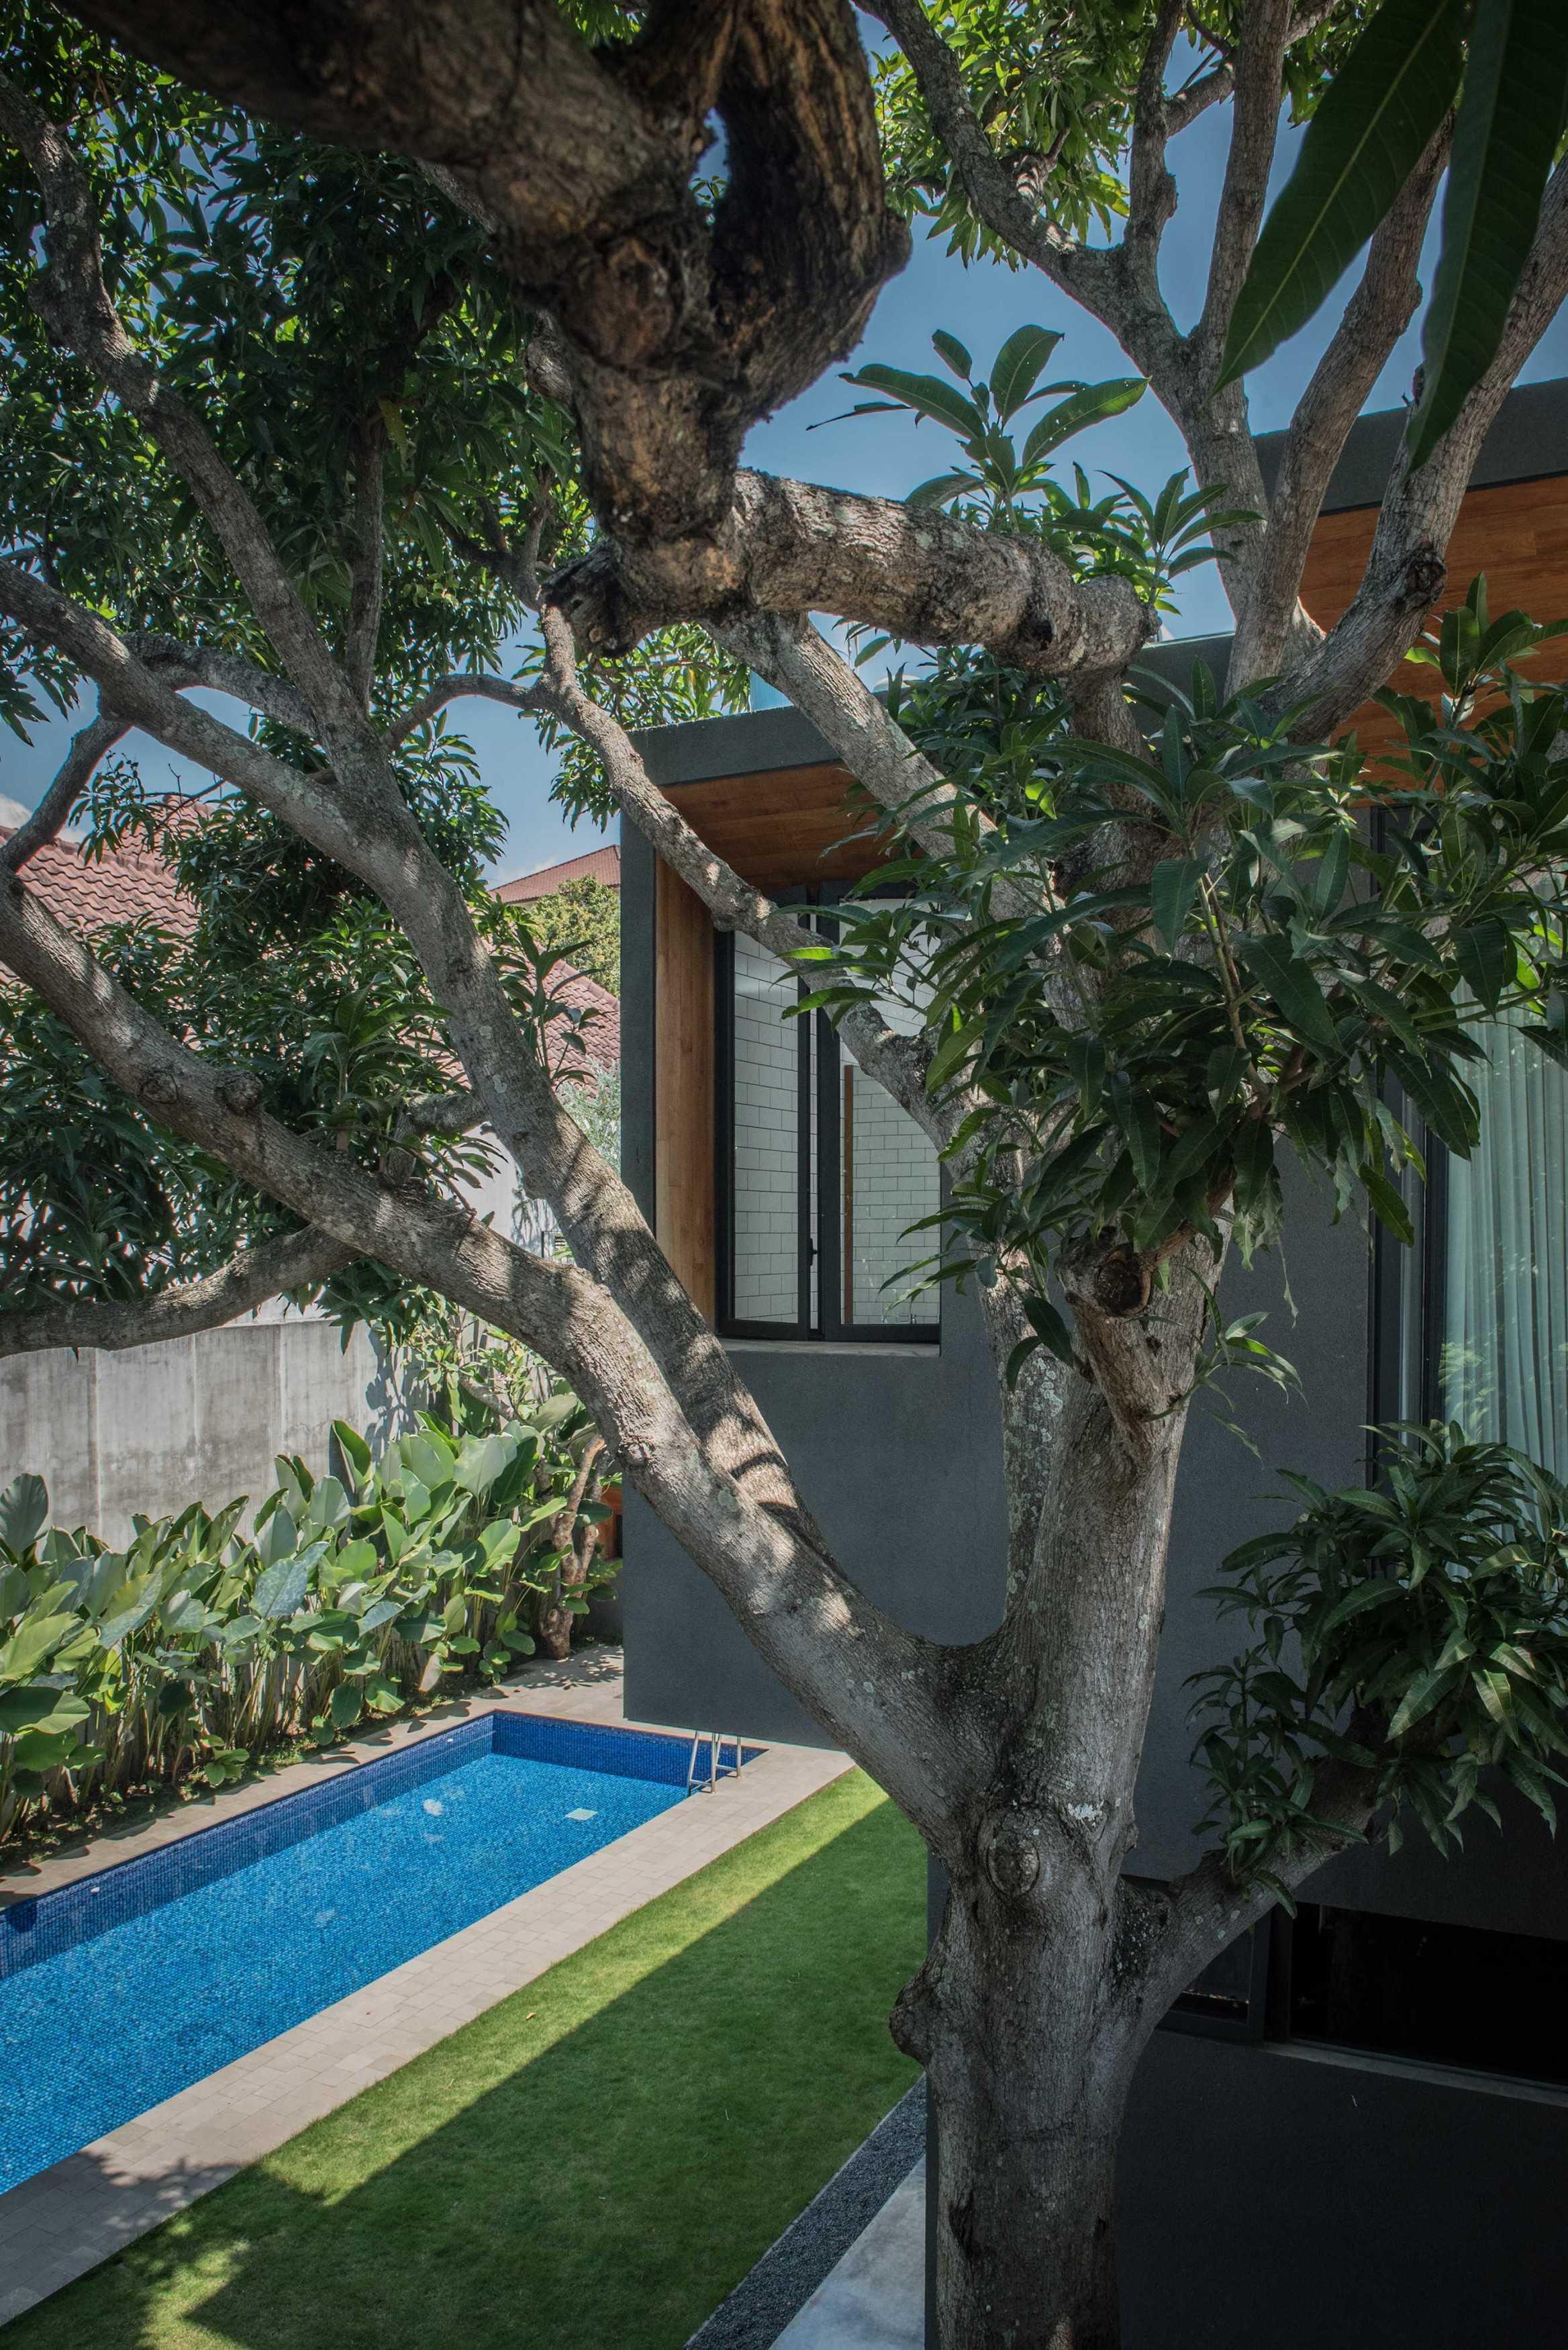 Tamara Wibowo House 1 Semarang, Semarang City, Central Java, Indonesia Semarang, Indonesia Swimming Pool View   17947